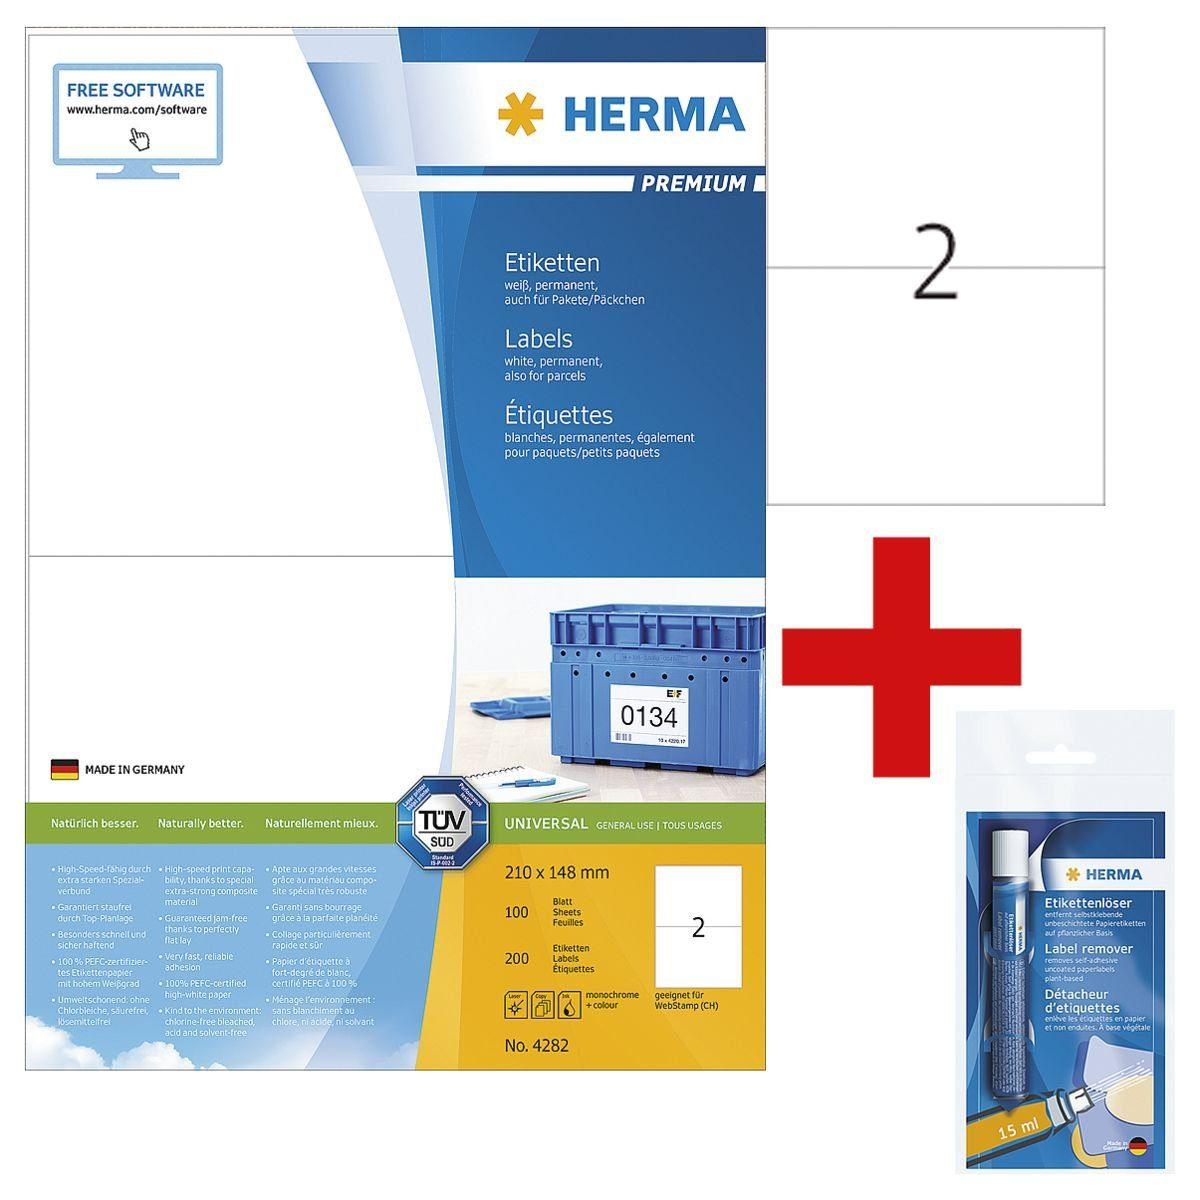 HERMA 200er-Pack Universal-Klebeetiketten inkl. Etikettenlöser... »4282« 1 Set